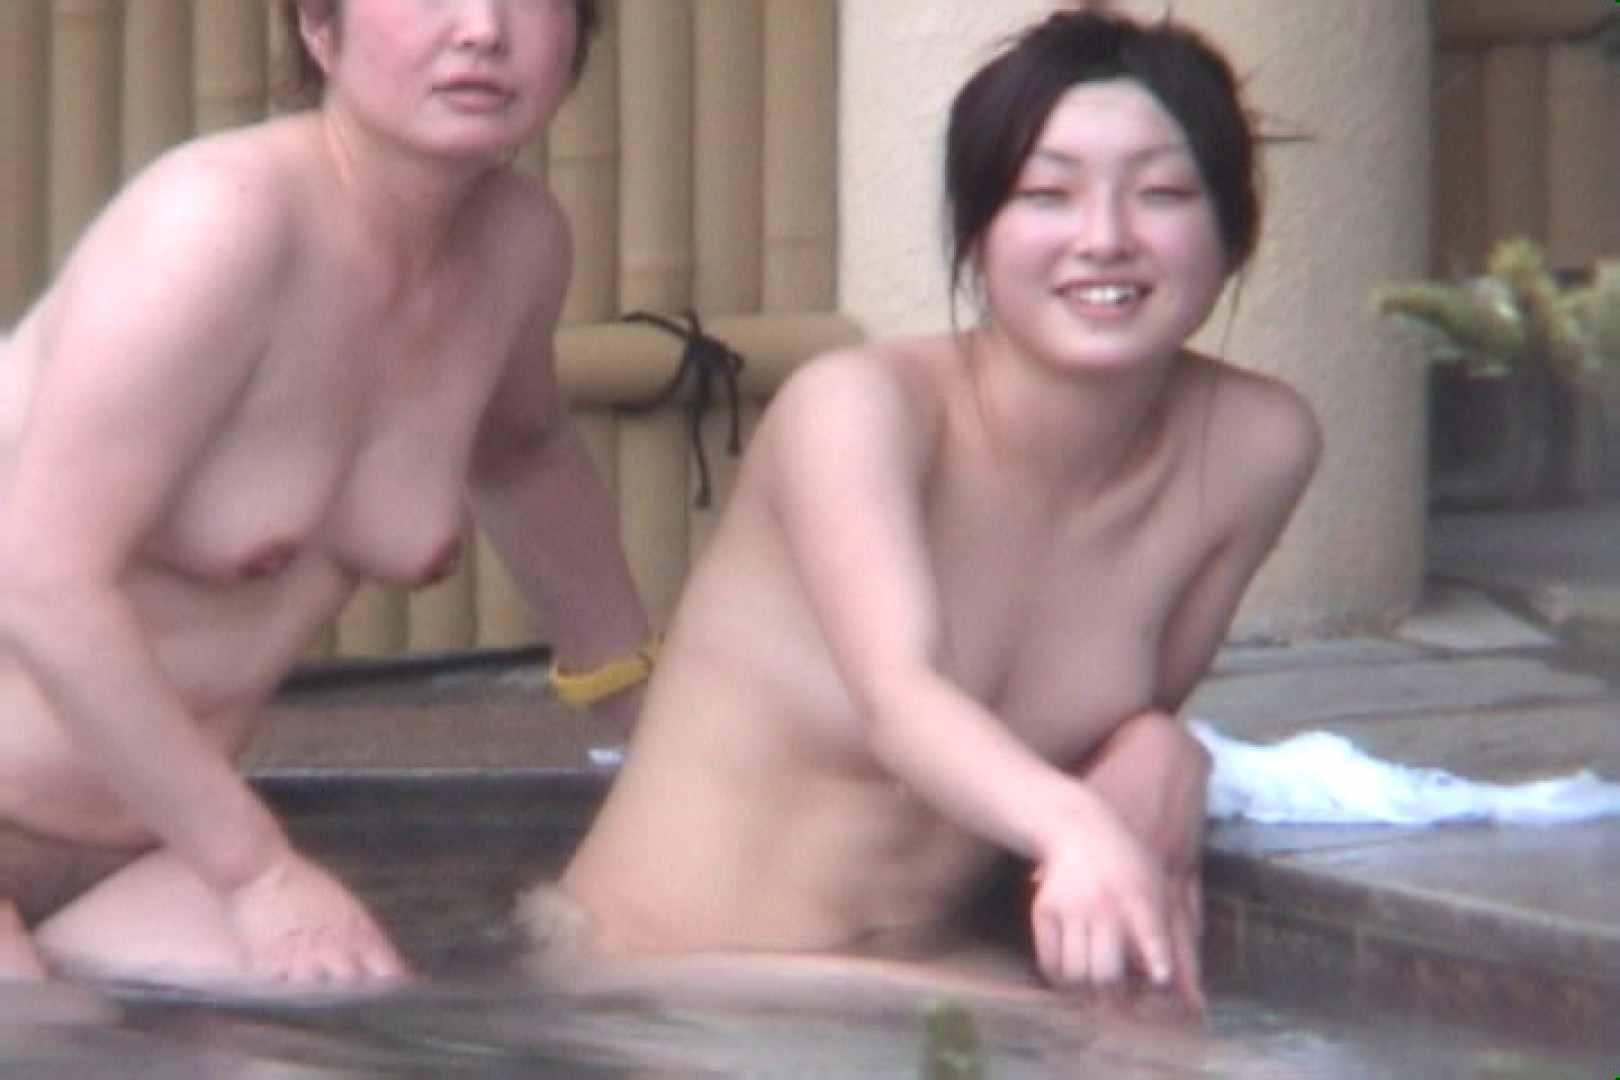 Aquaな露天風呂Vol.44【VIP限定】 盗撮大放出 セックス画像 72連発 8